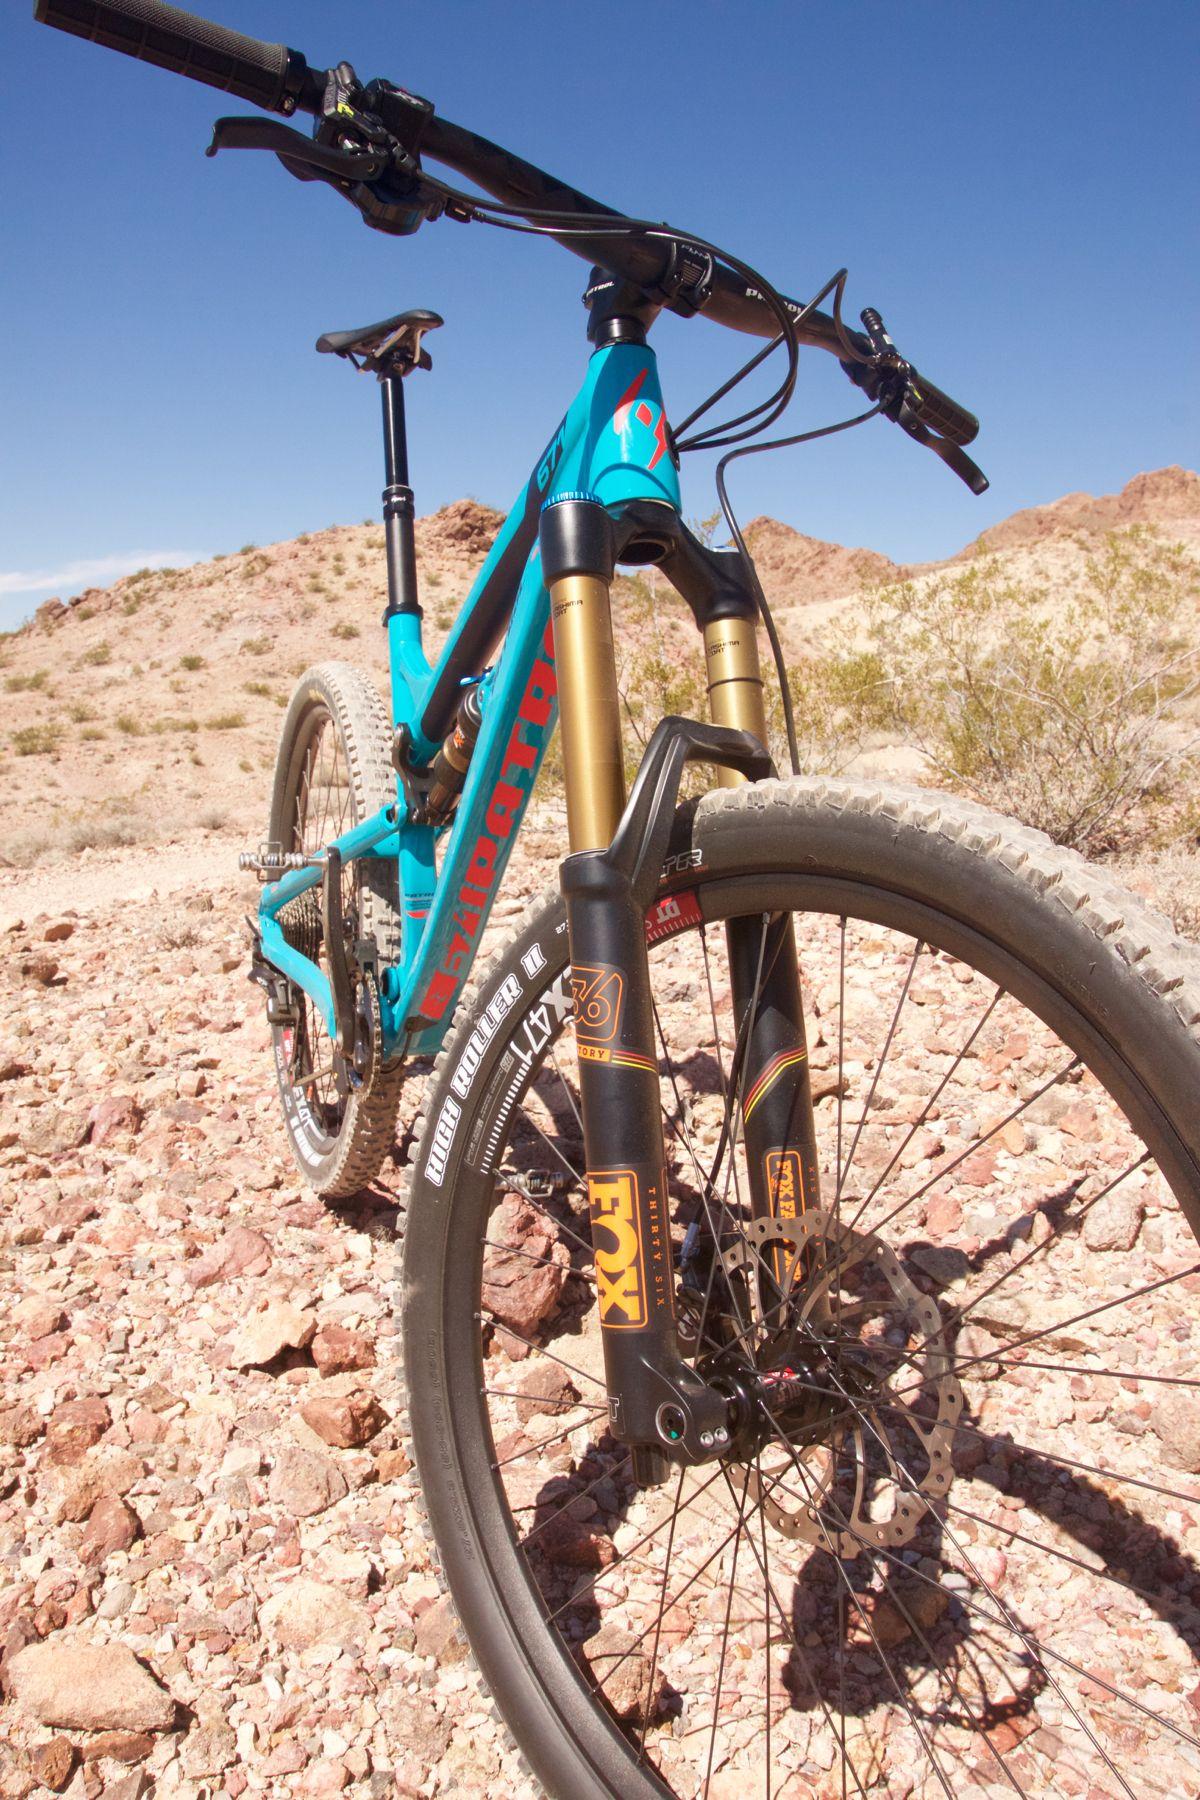 First Look Patrol 671 Enduro Bike Mountain Biking Gear